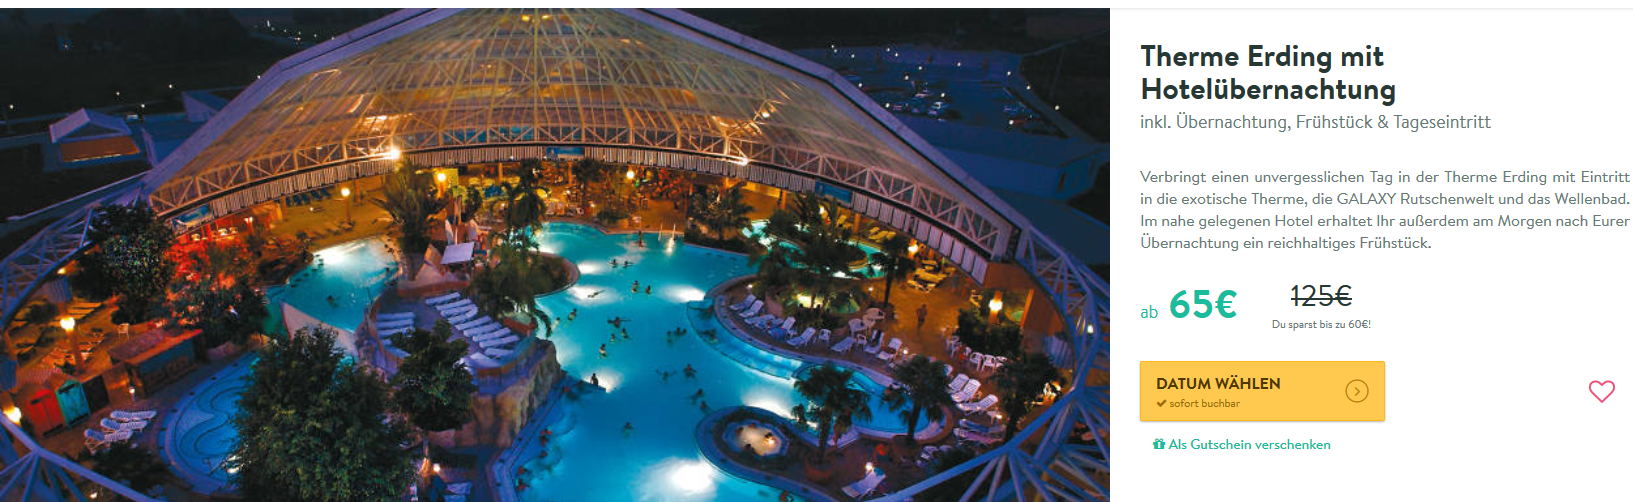 Screenshot Deal Therme Erding Preise im Keller ab 65,00€ anstatt 125,00€ ! Hotel & Tageseintritt